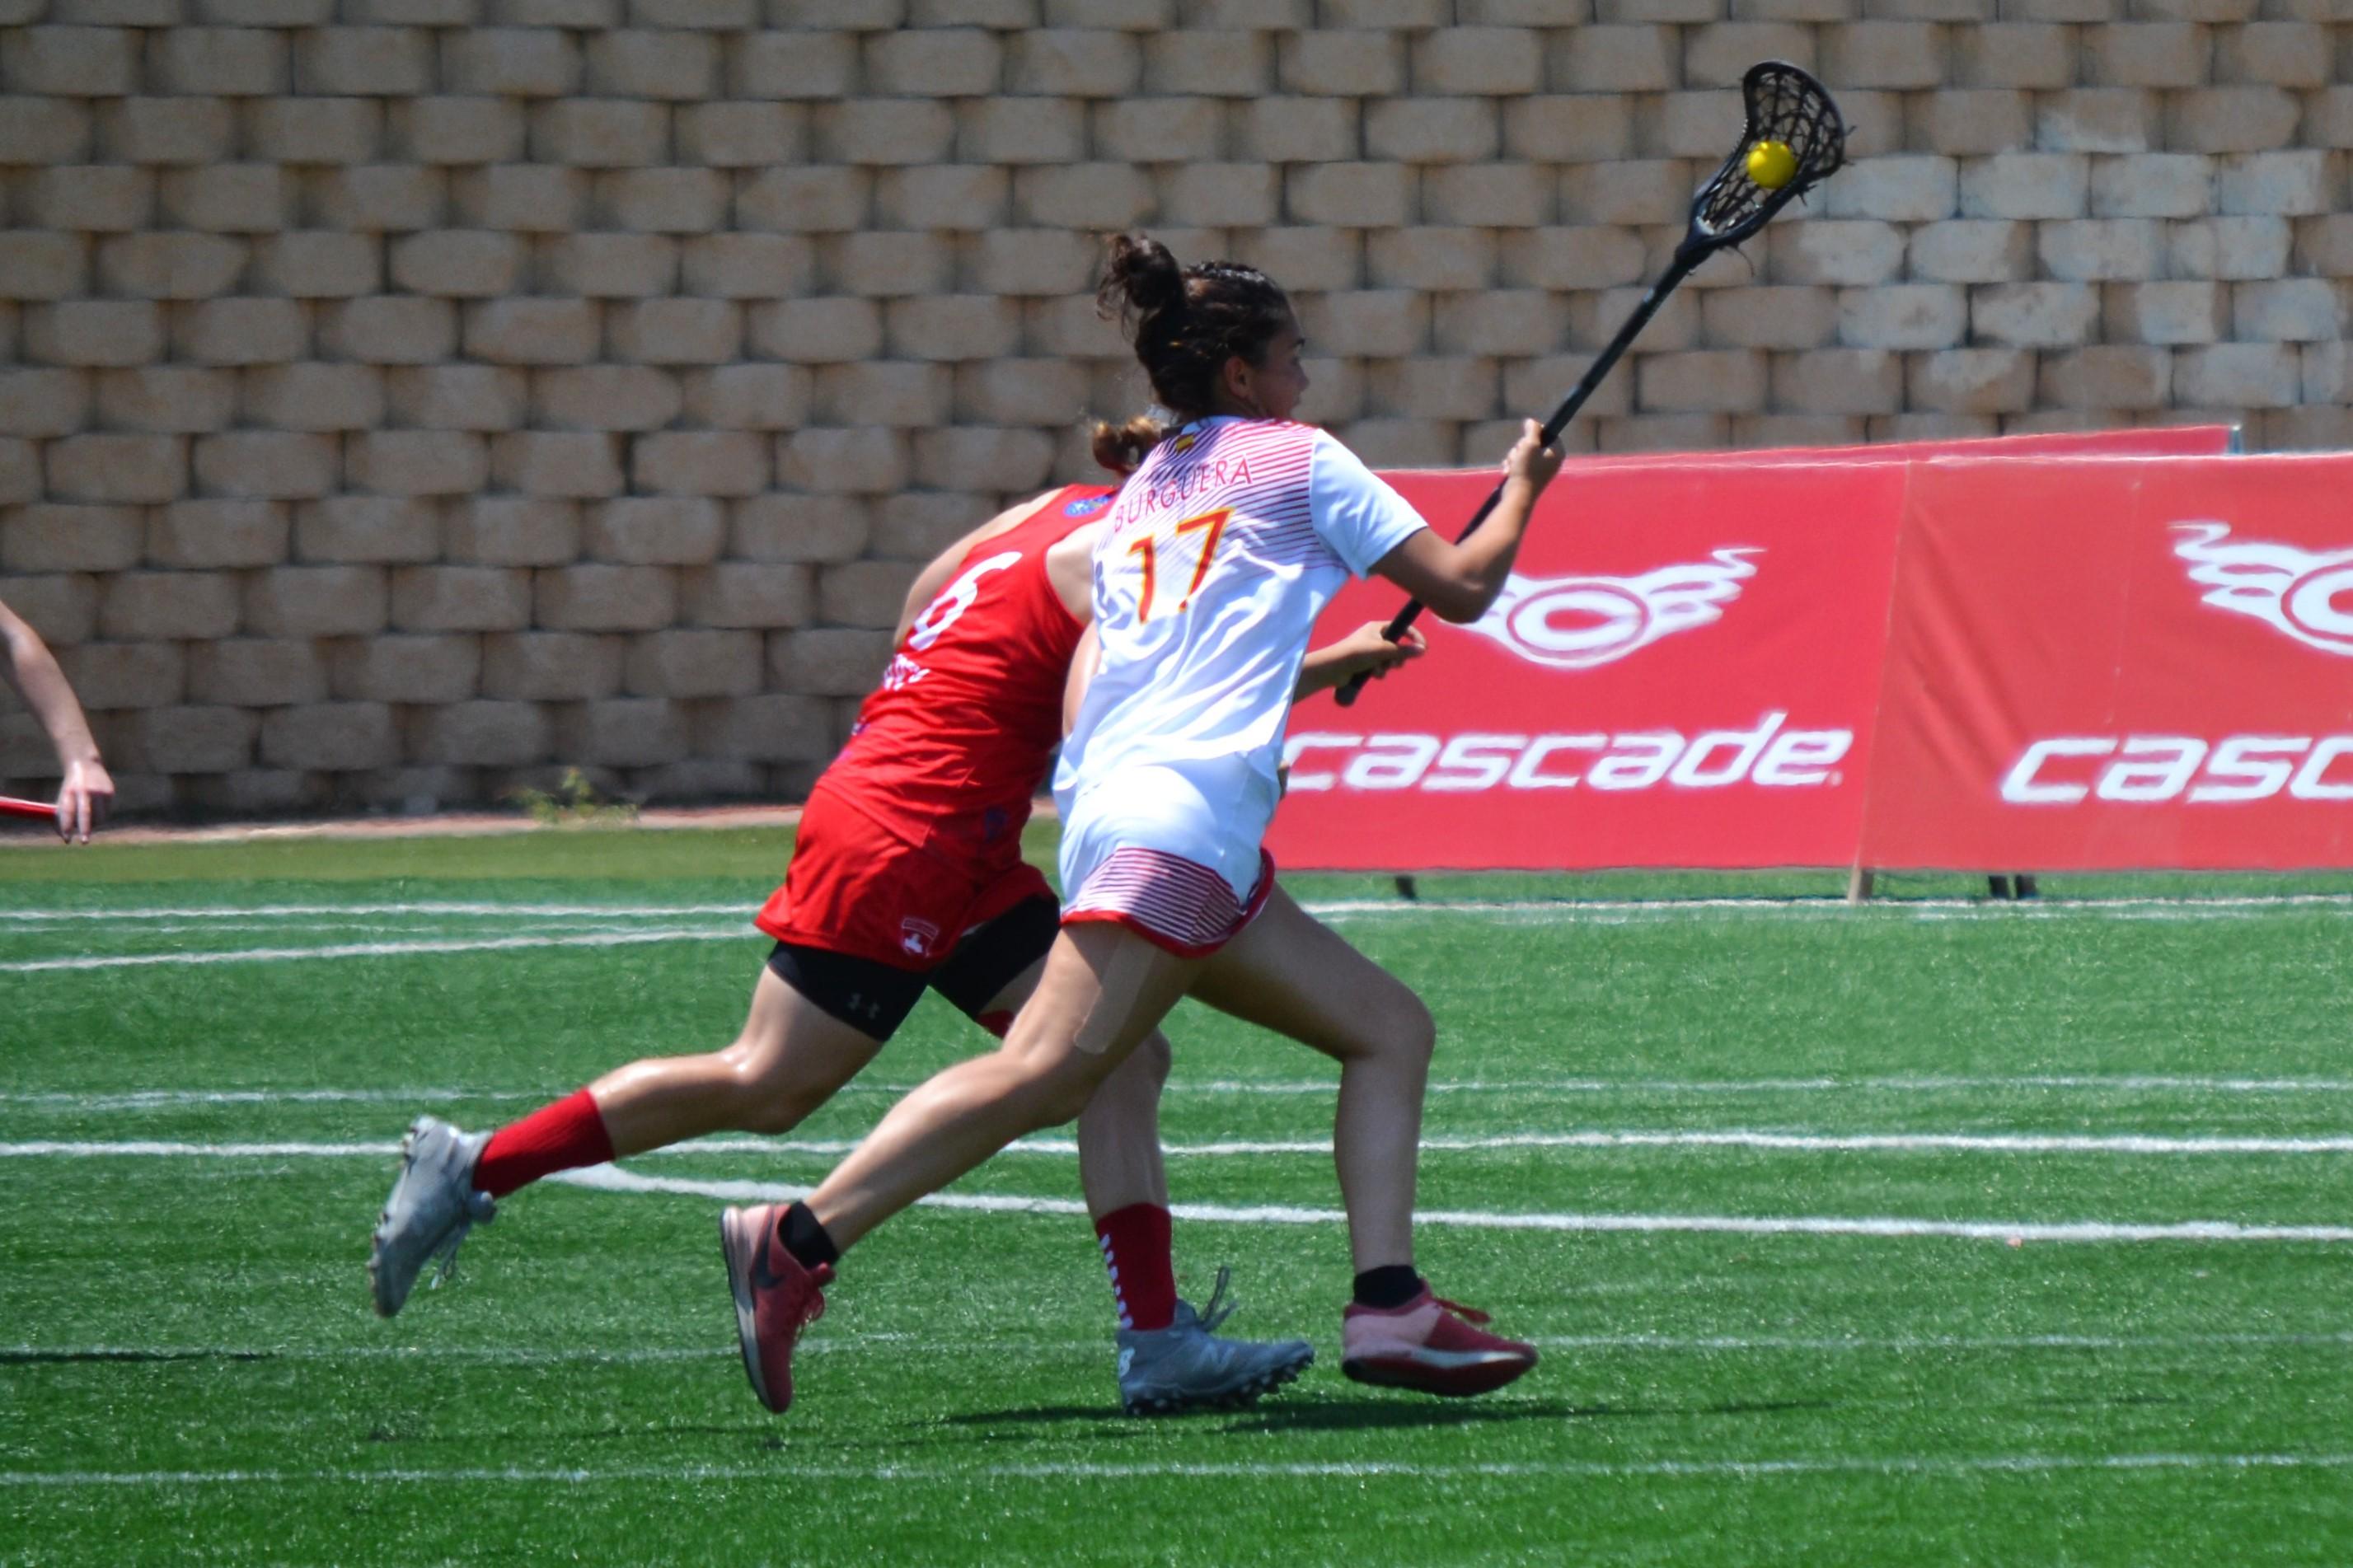 Burguera_spain_lacrosse_European_2019